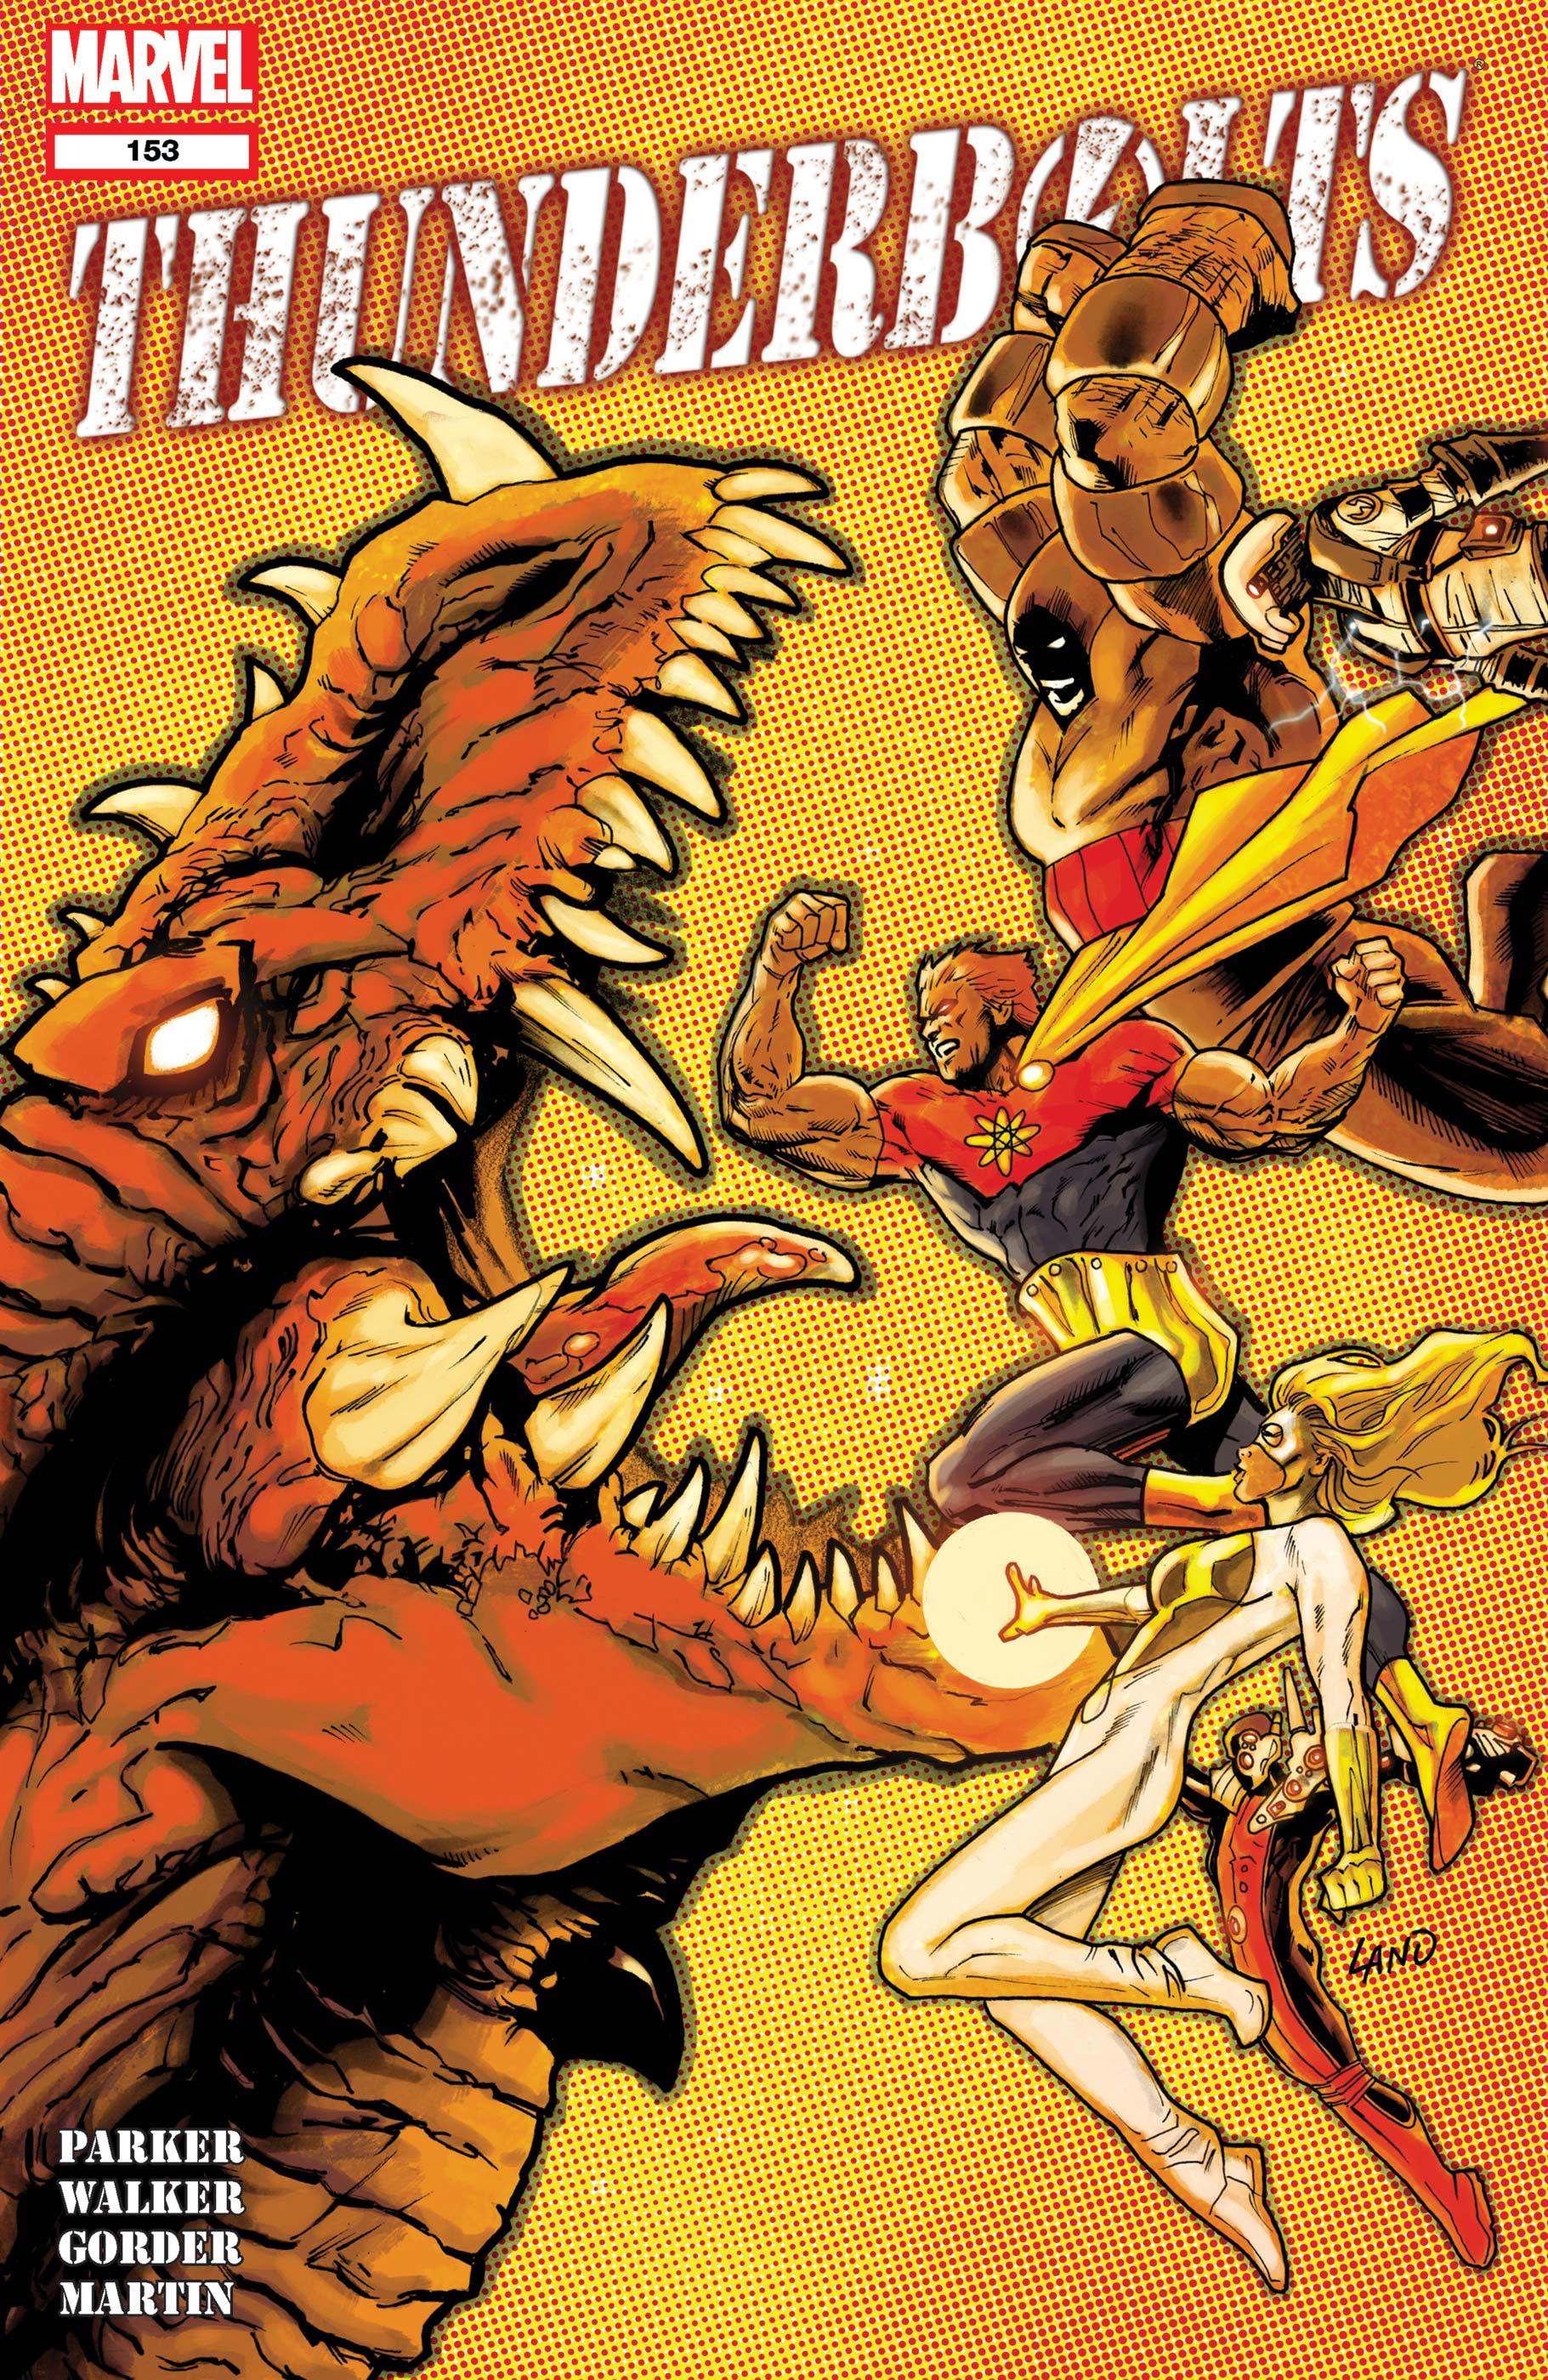 Thunderbolts (2006) #153